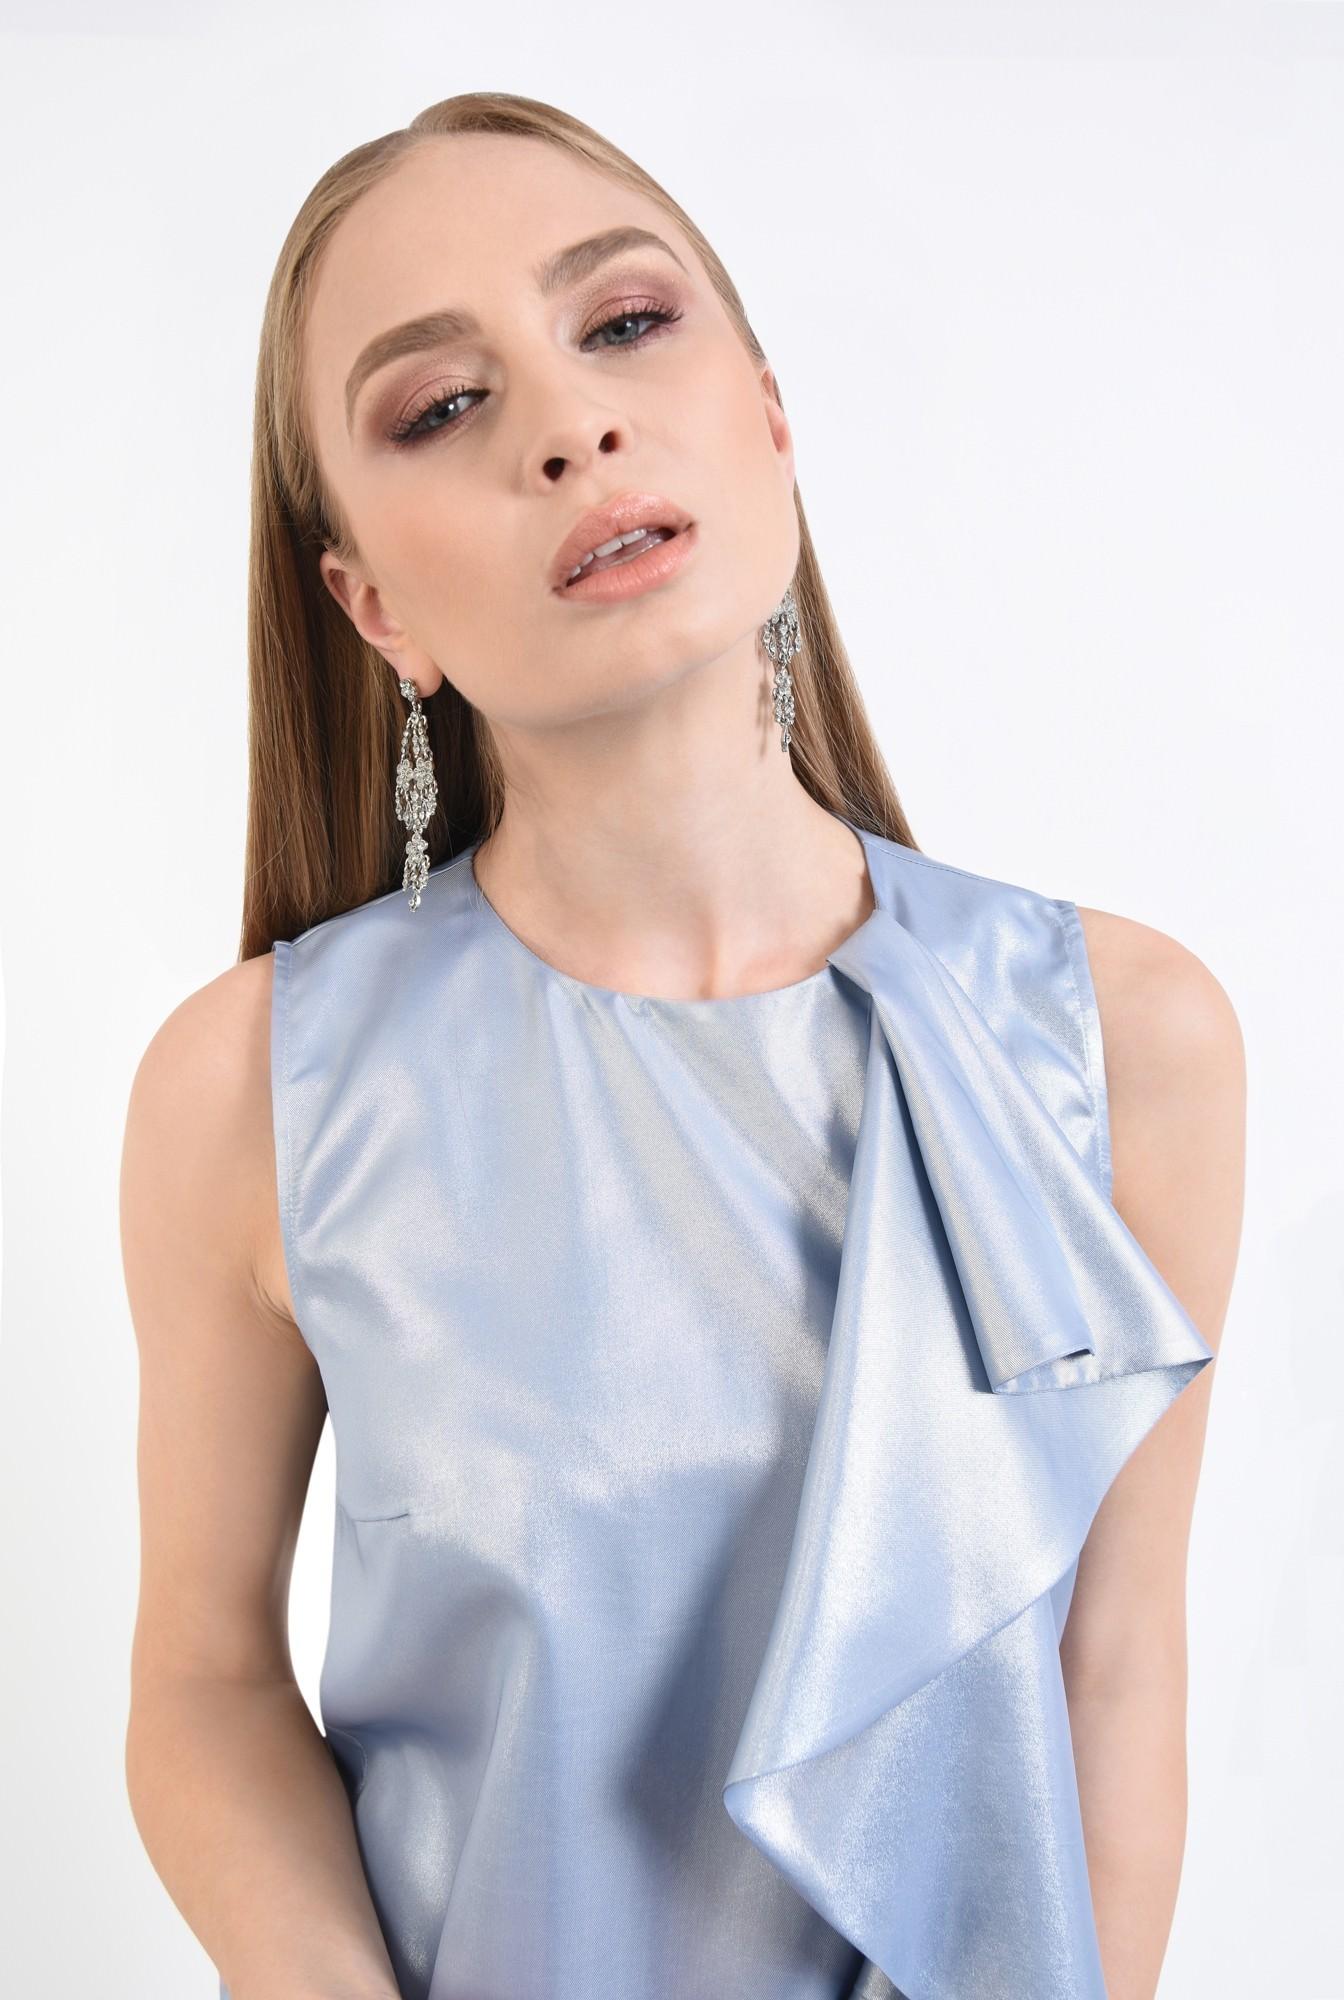 2 - rochie de ocazie, bleu, argintiu, scurta